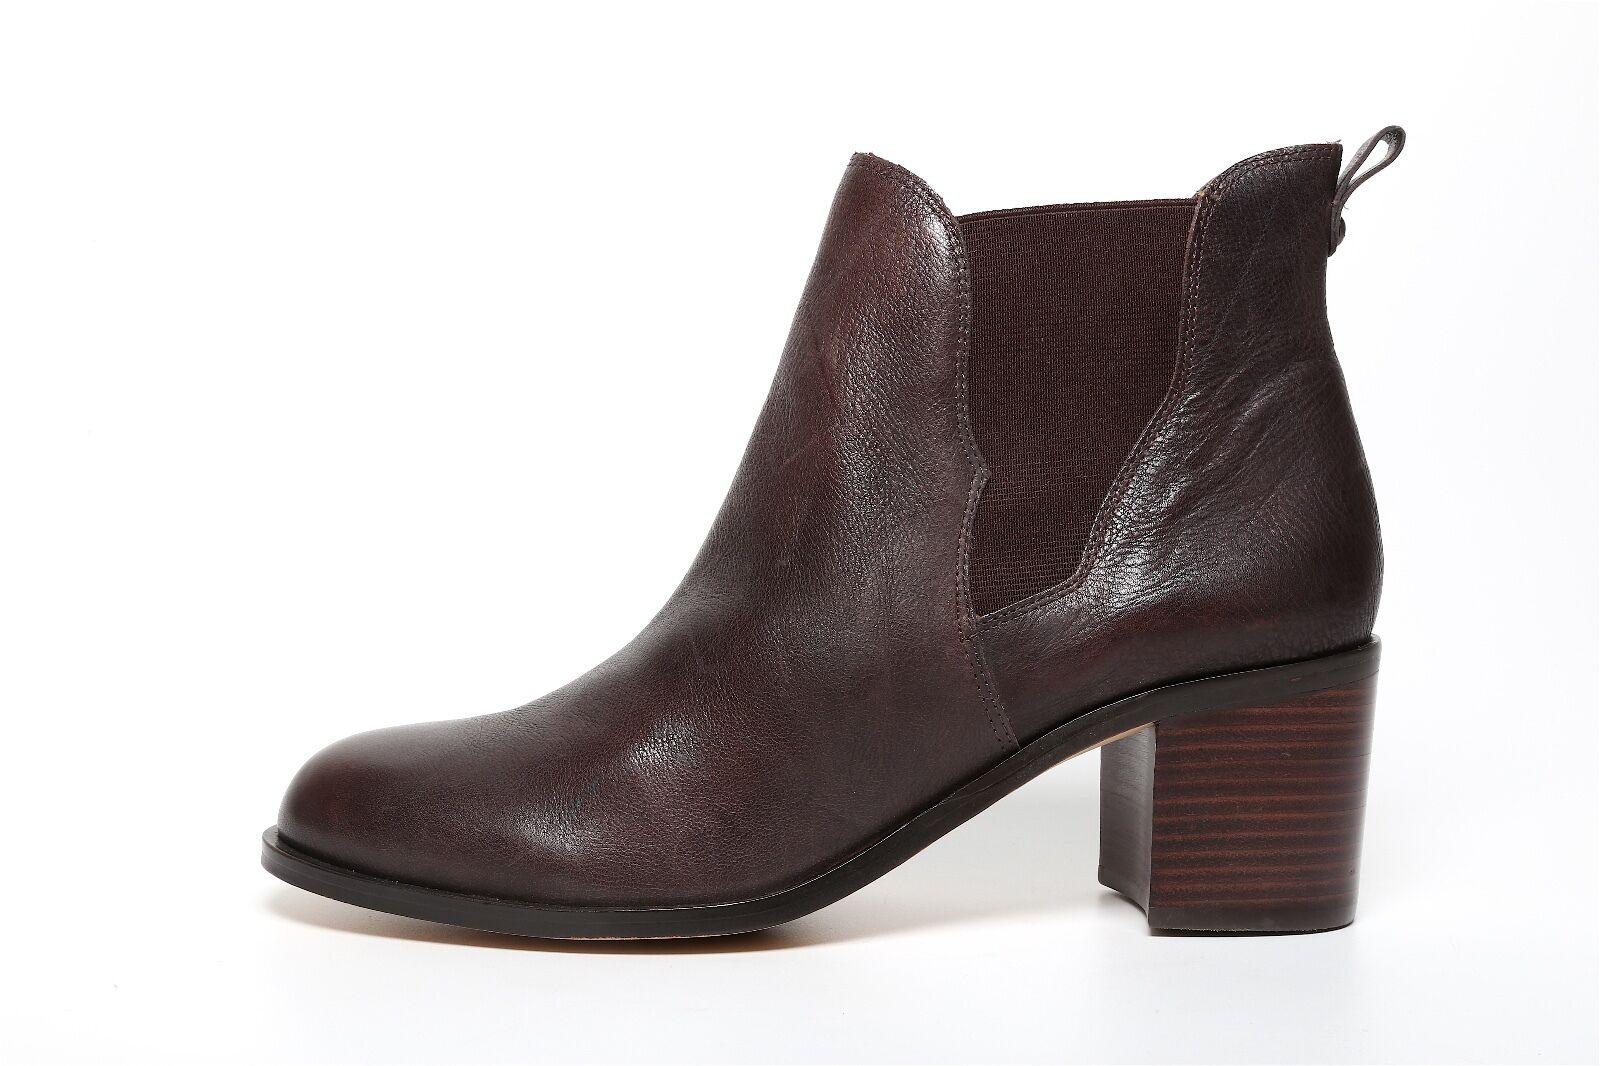 Sam Edelman Women's Brown Slip On Ankle Booties 2120 Size 10.5 M